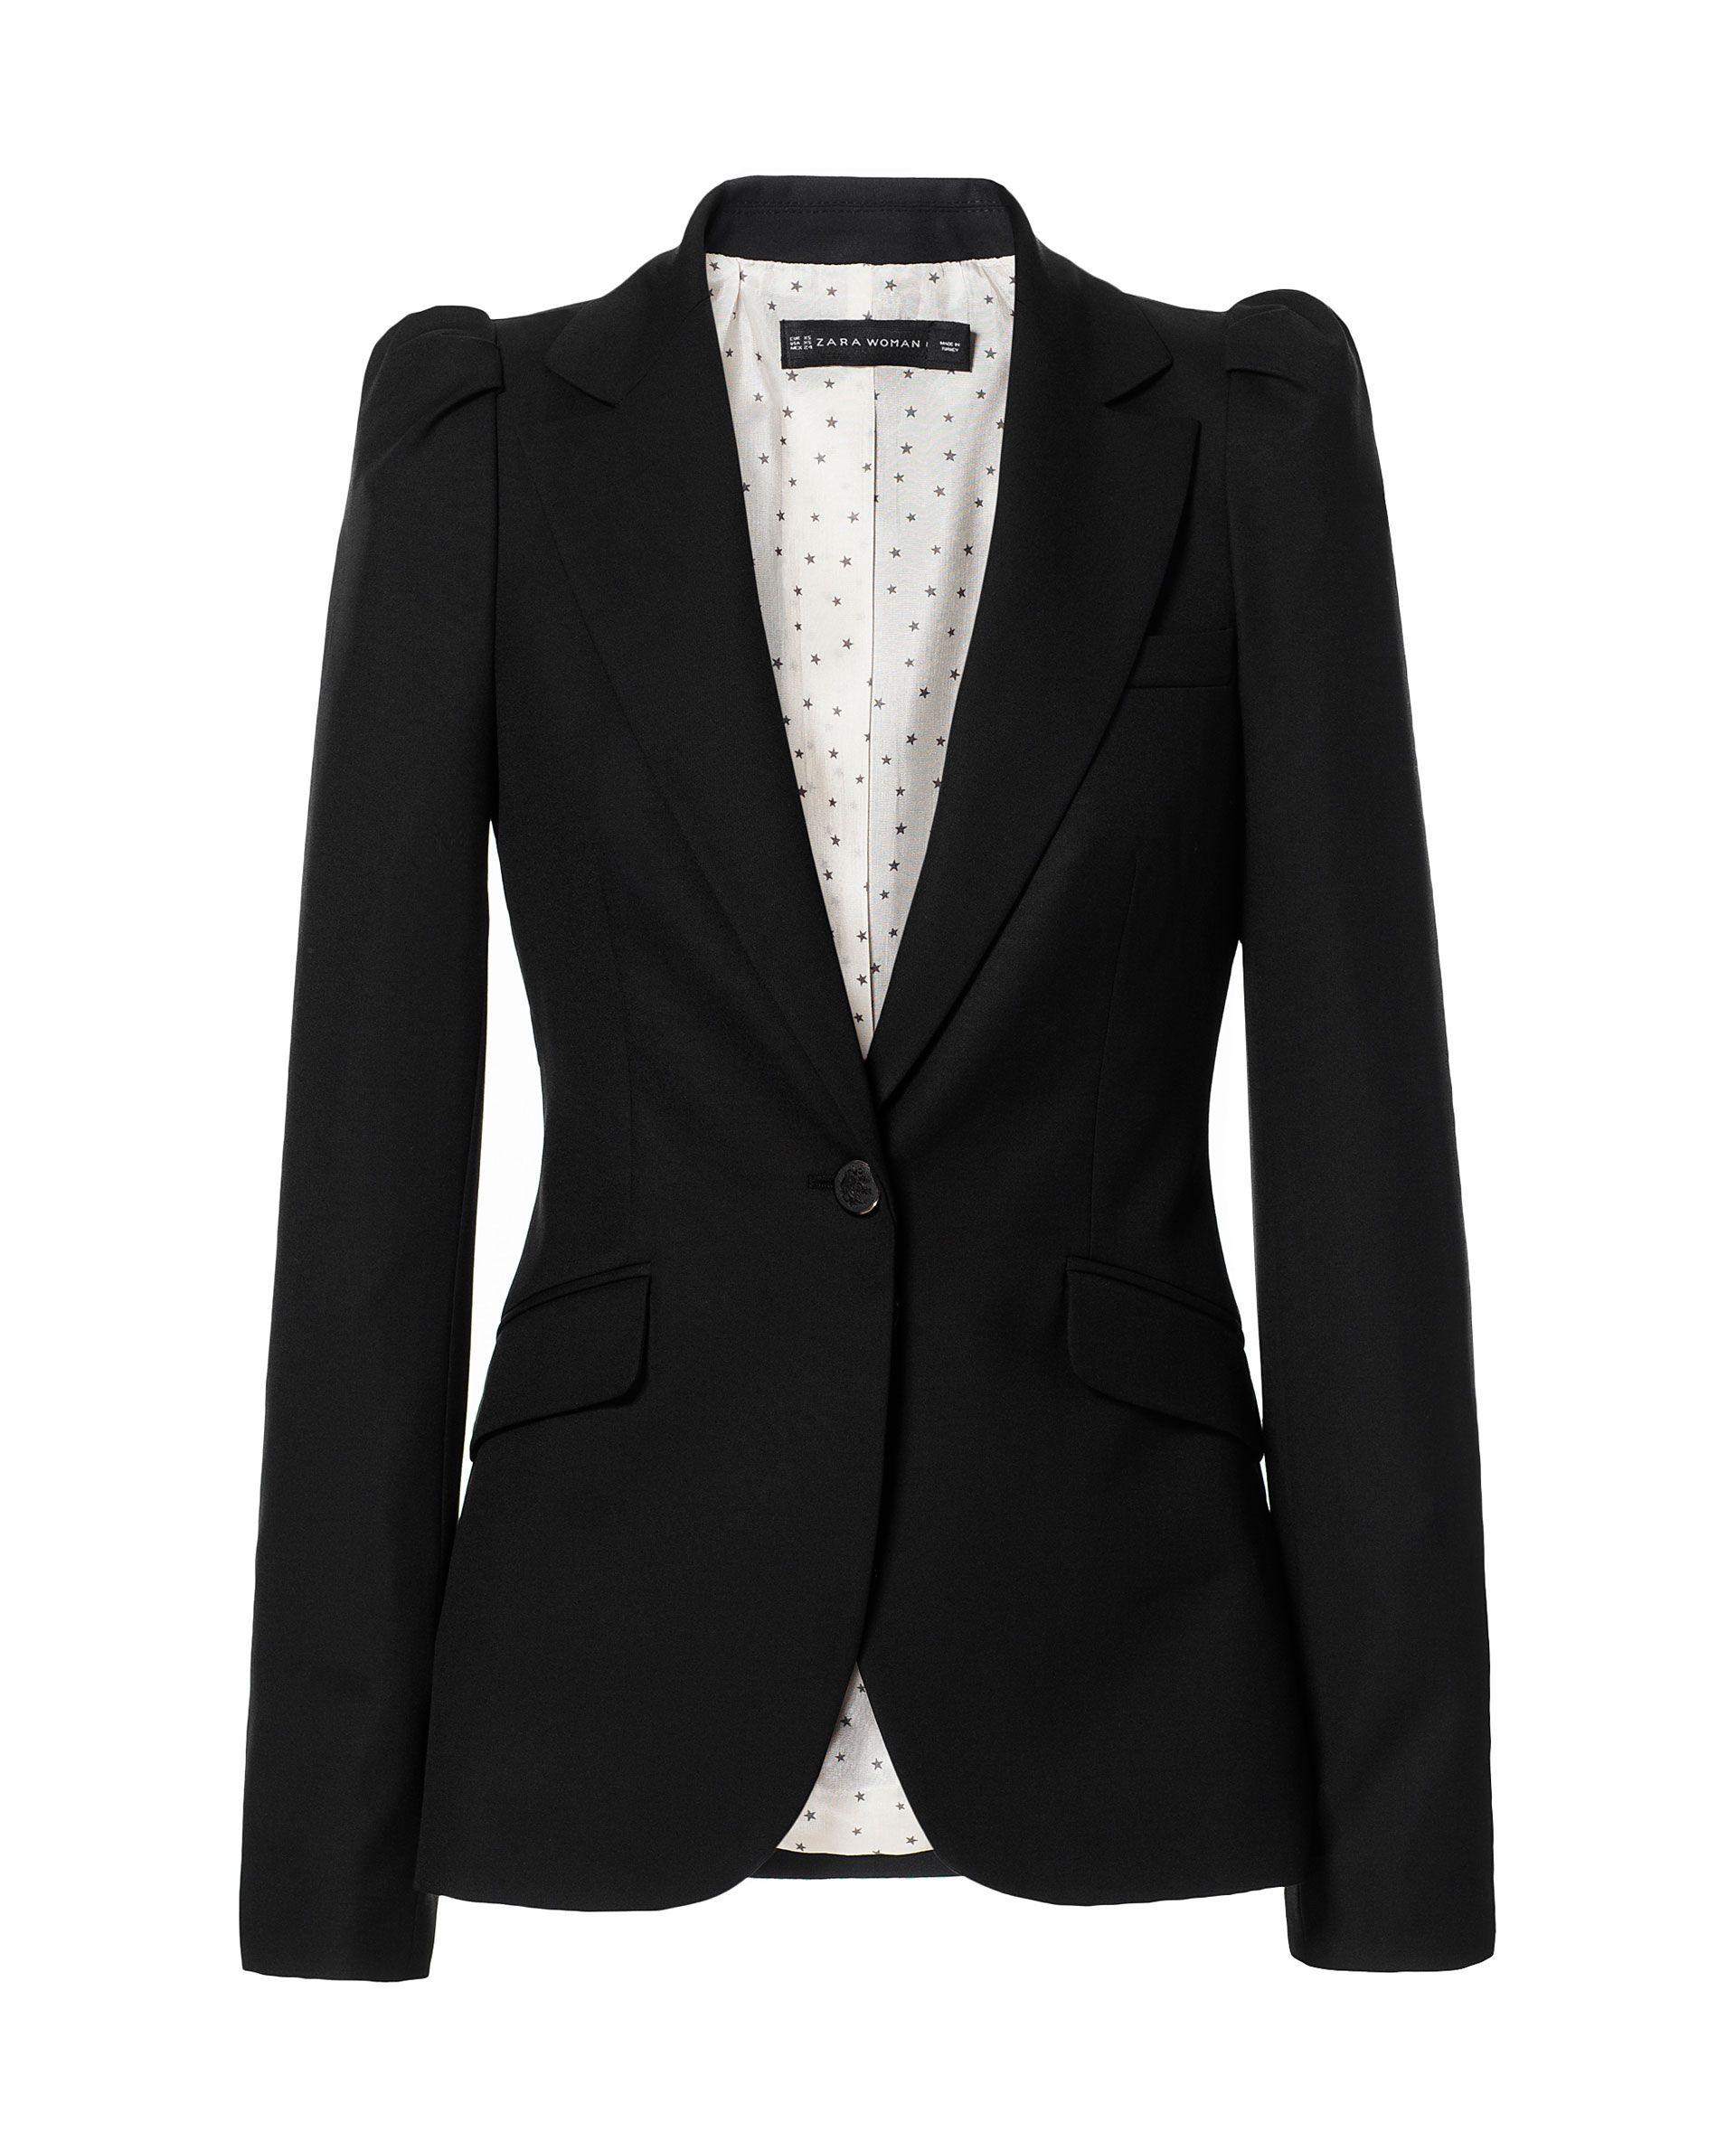 Zara Blazer with Gathered Shoulders in Black | Lyst